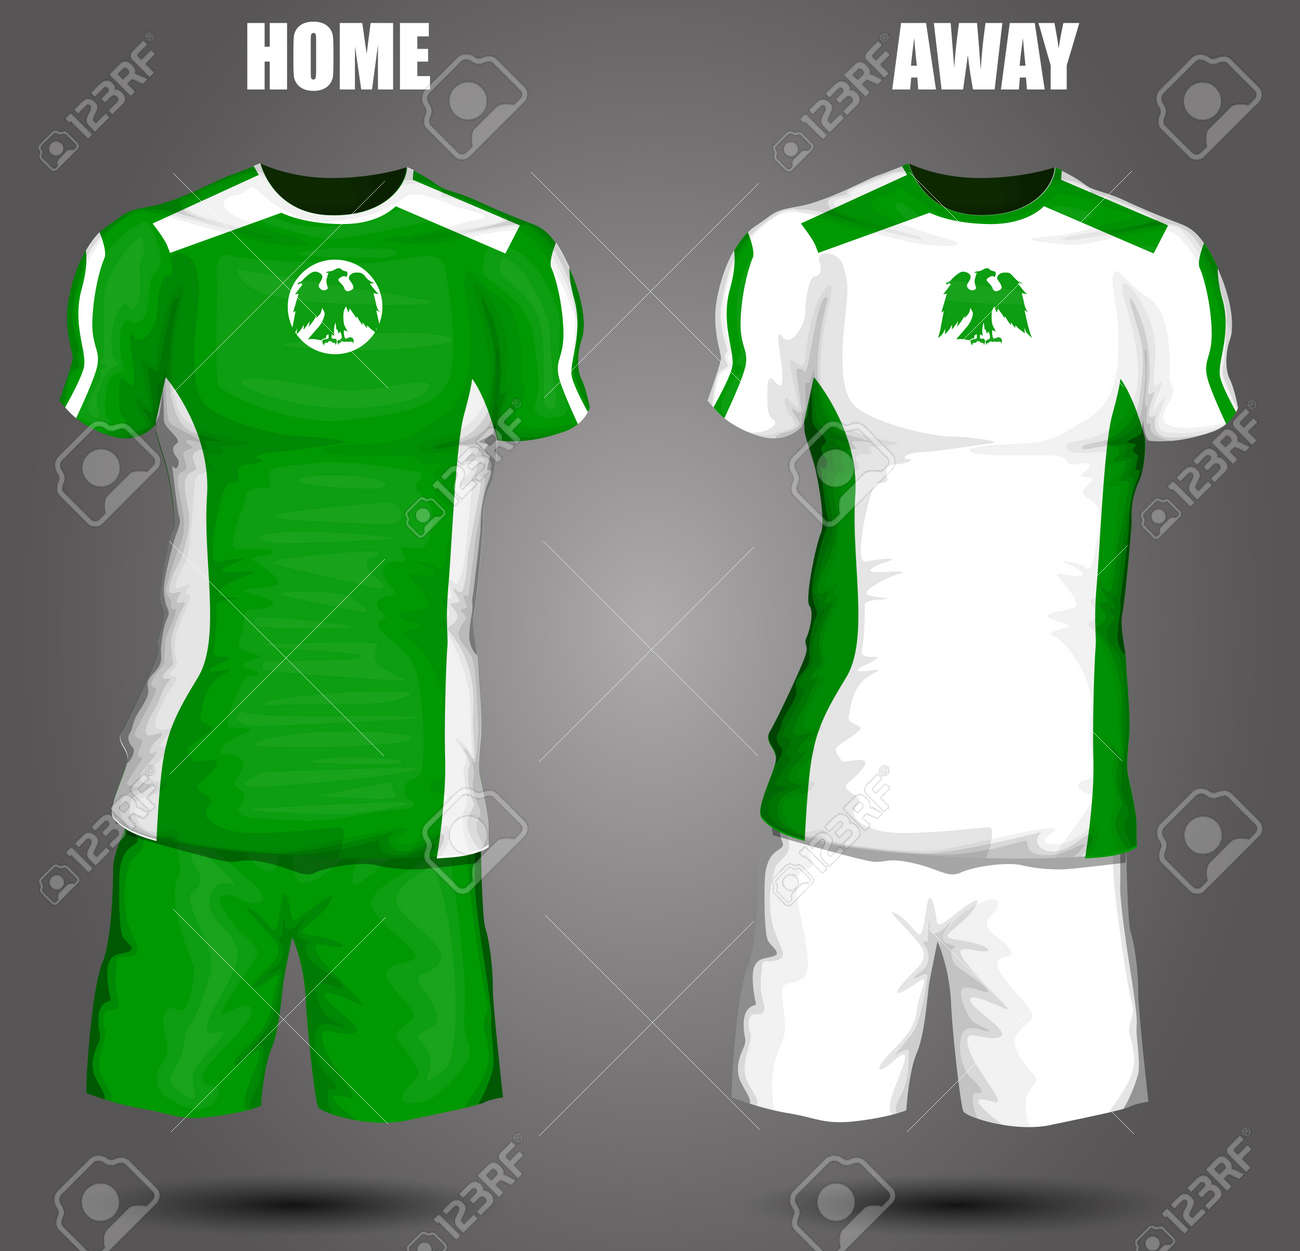 62a5a9d72 Nigeria soccer jersey Stock Vector - 28036614